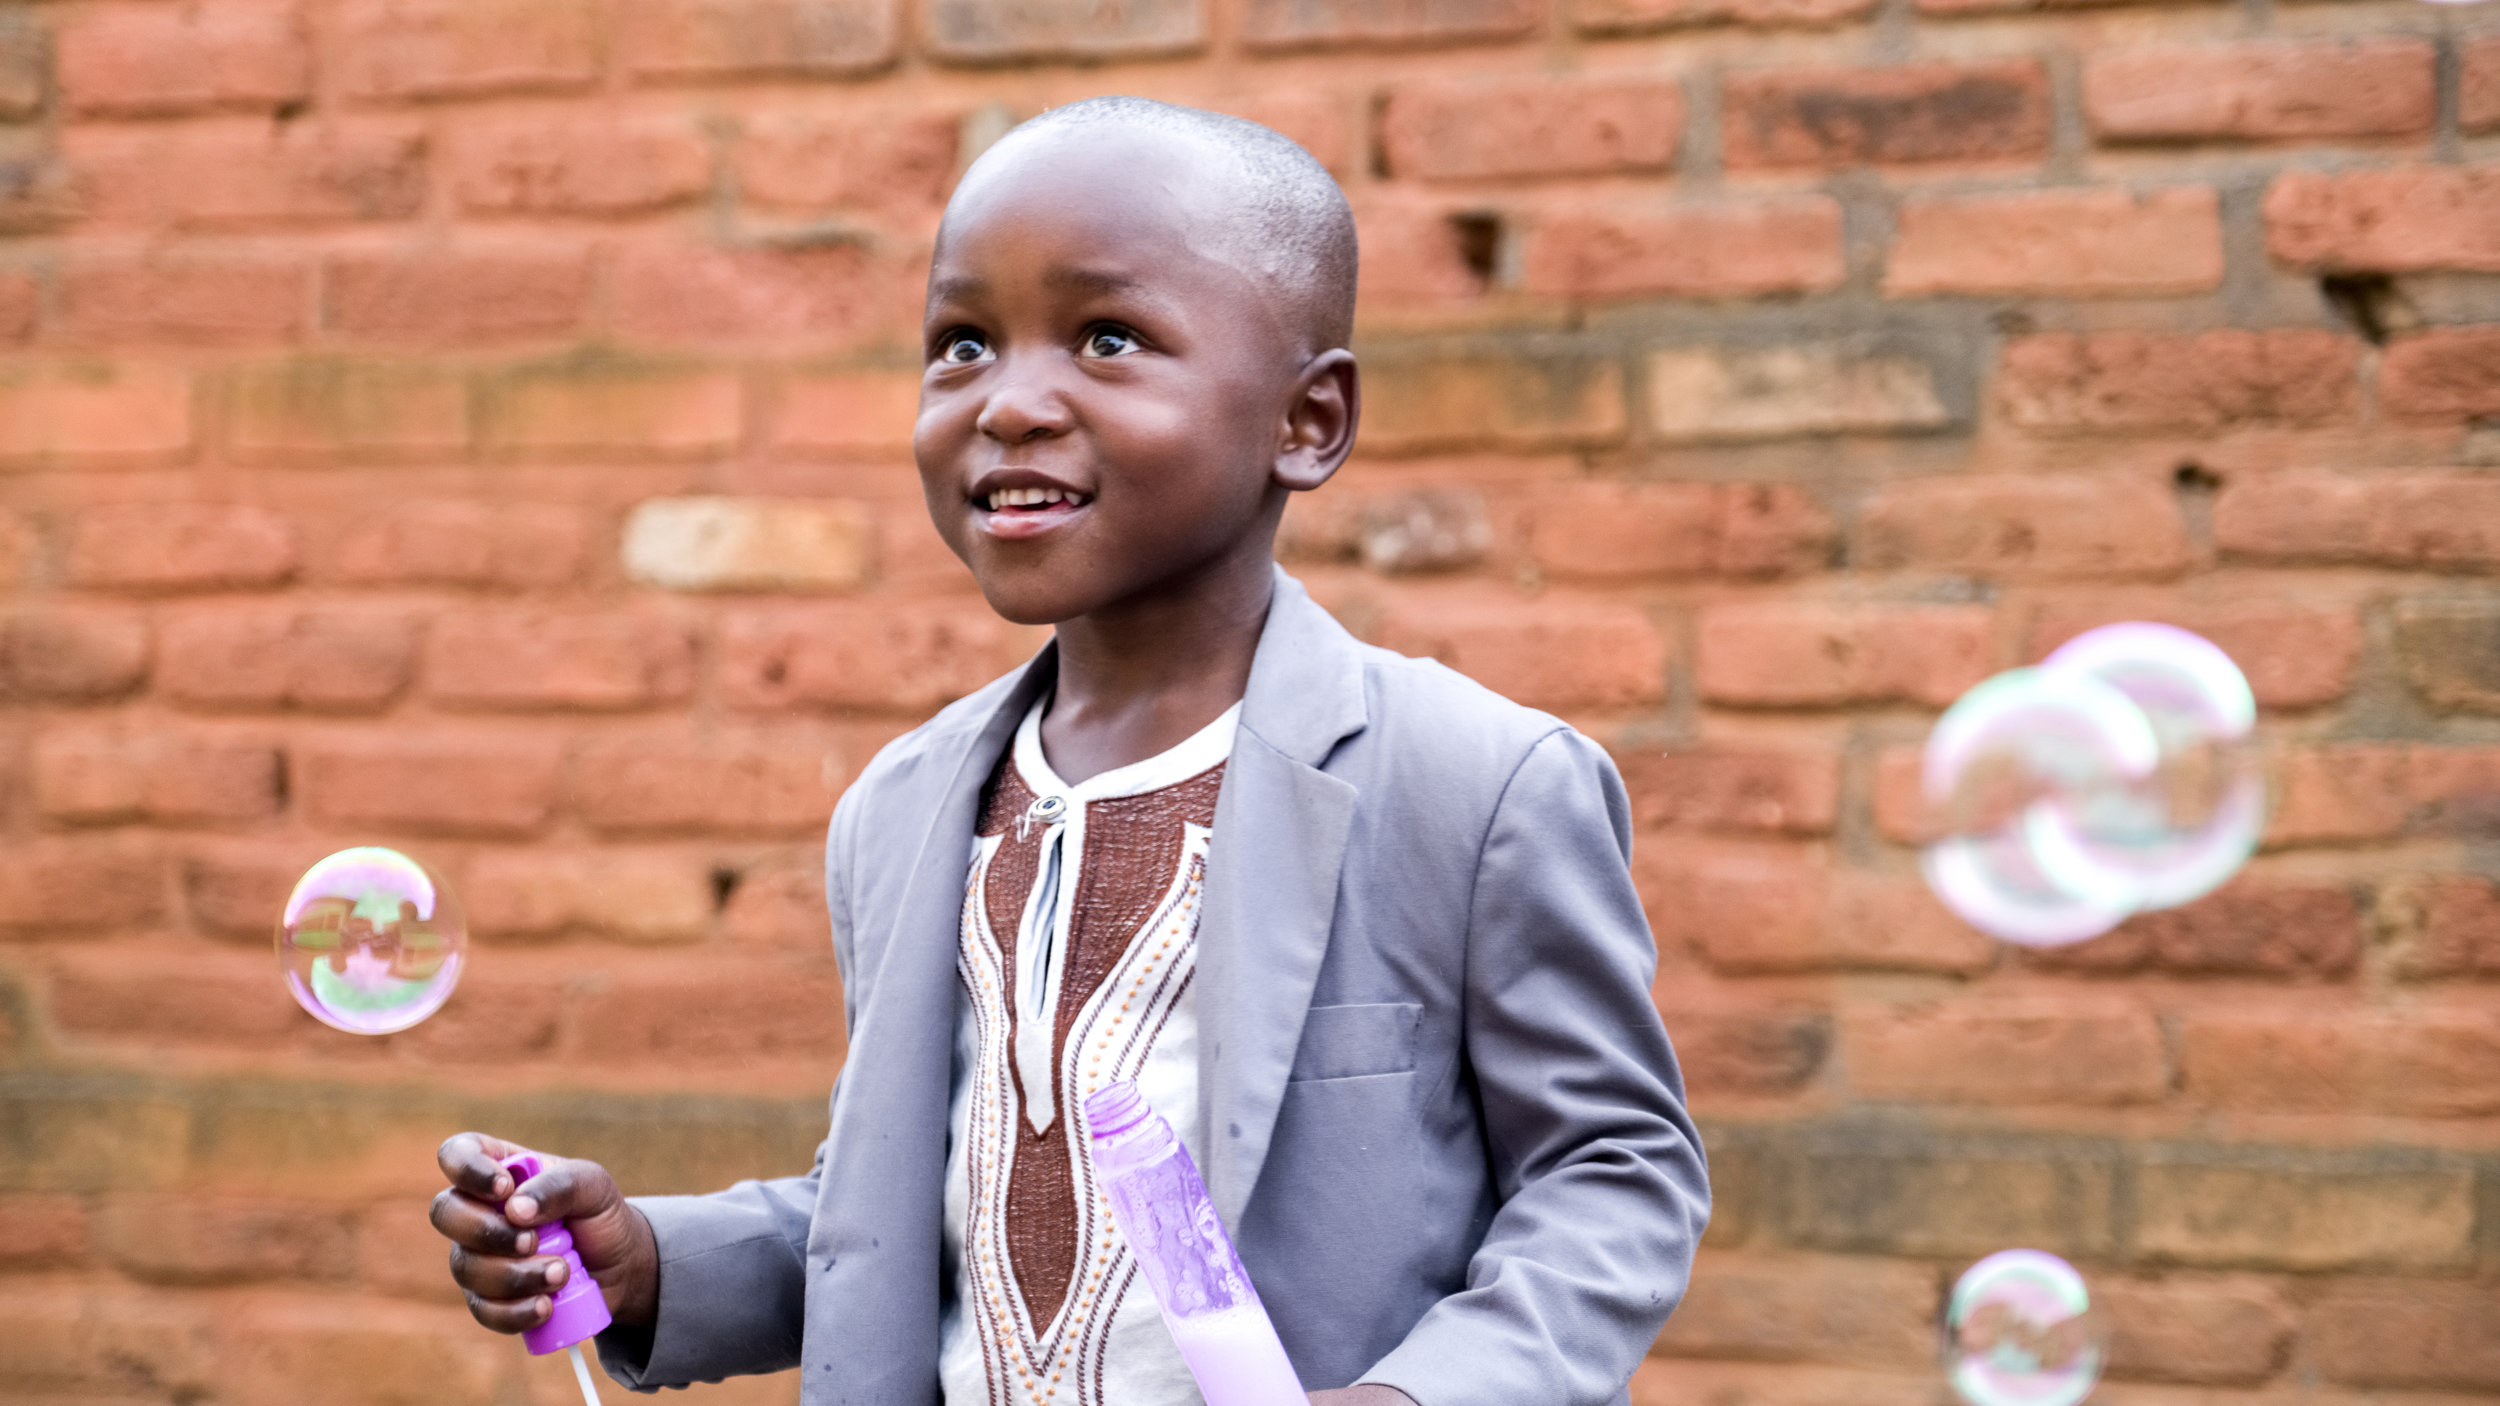 Ubushobozi is:   Sponsoring Children